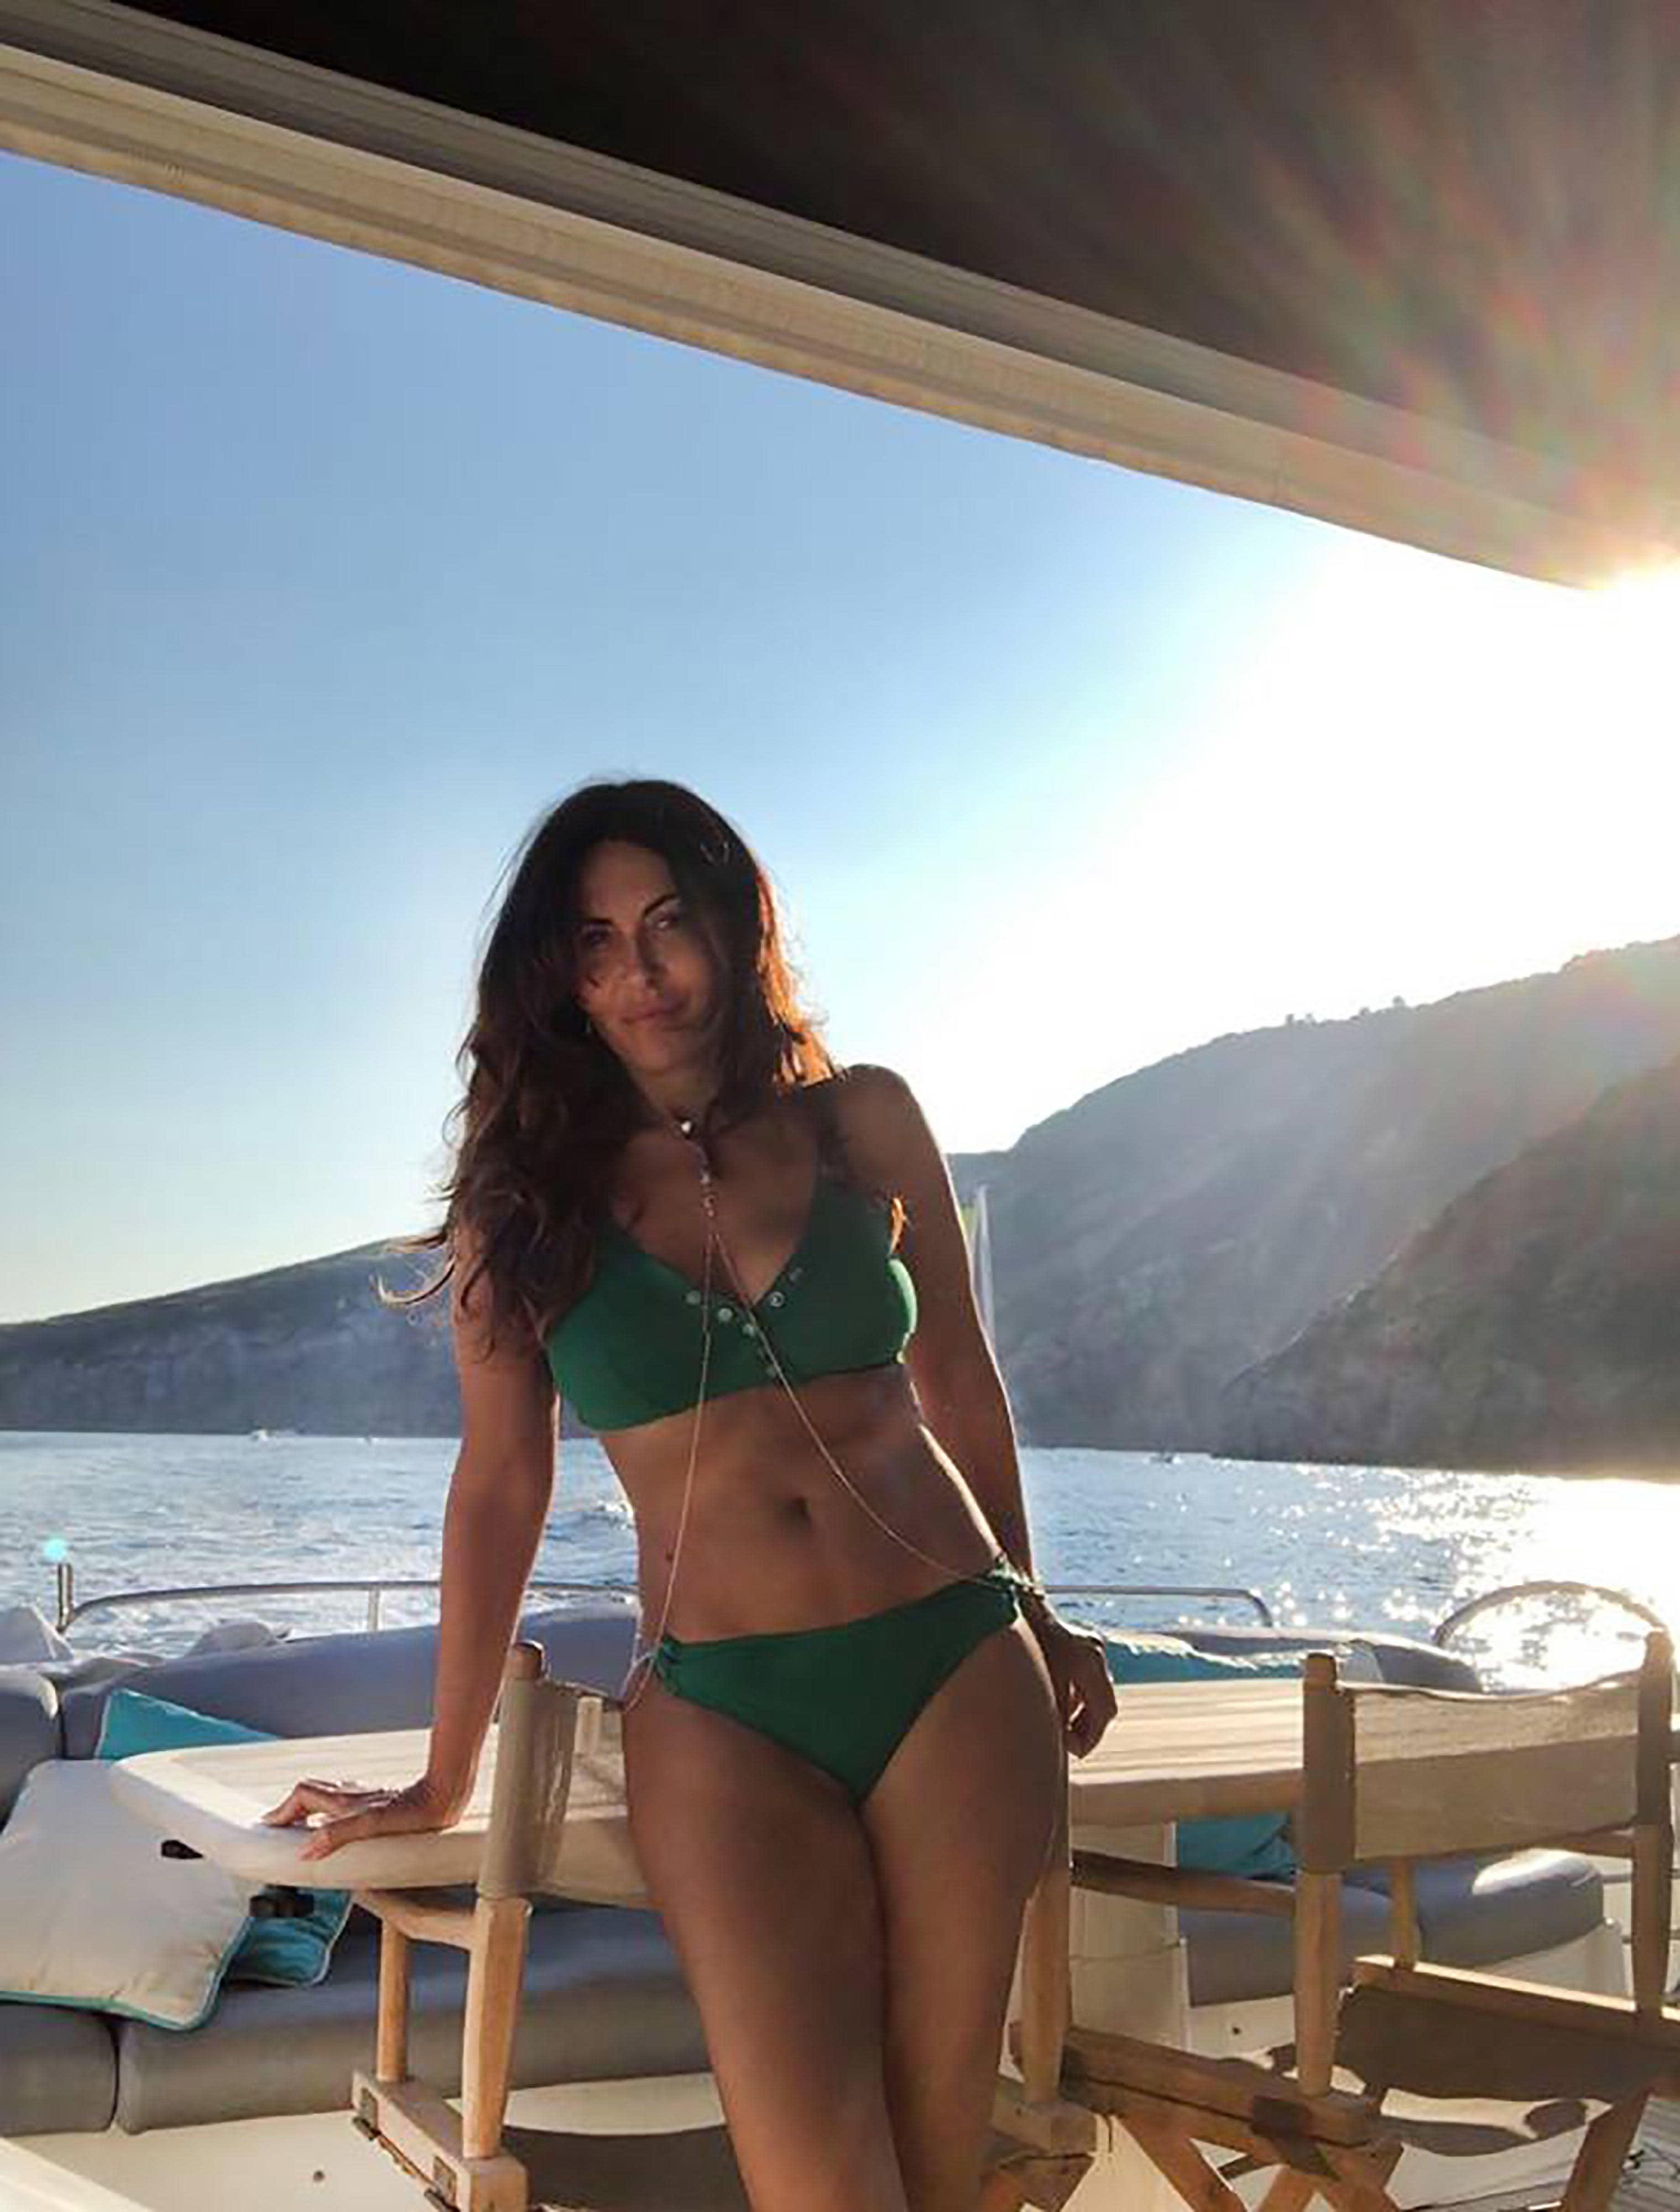 Sabrina ferilli young nude — photo 15